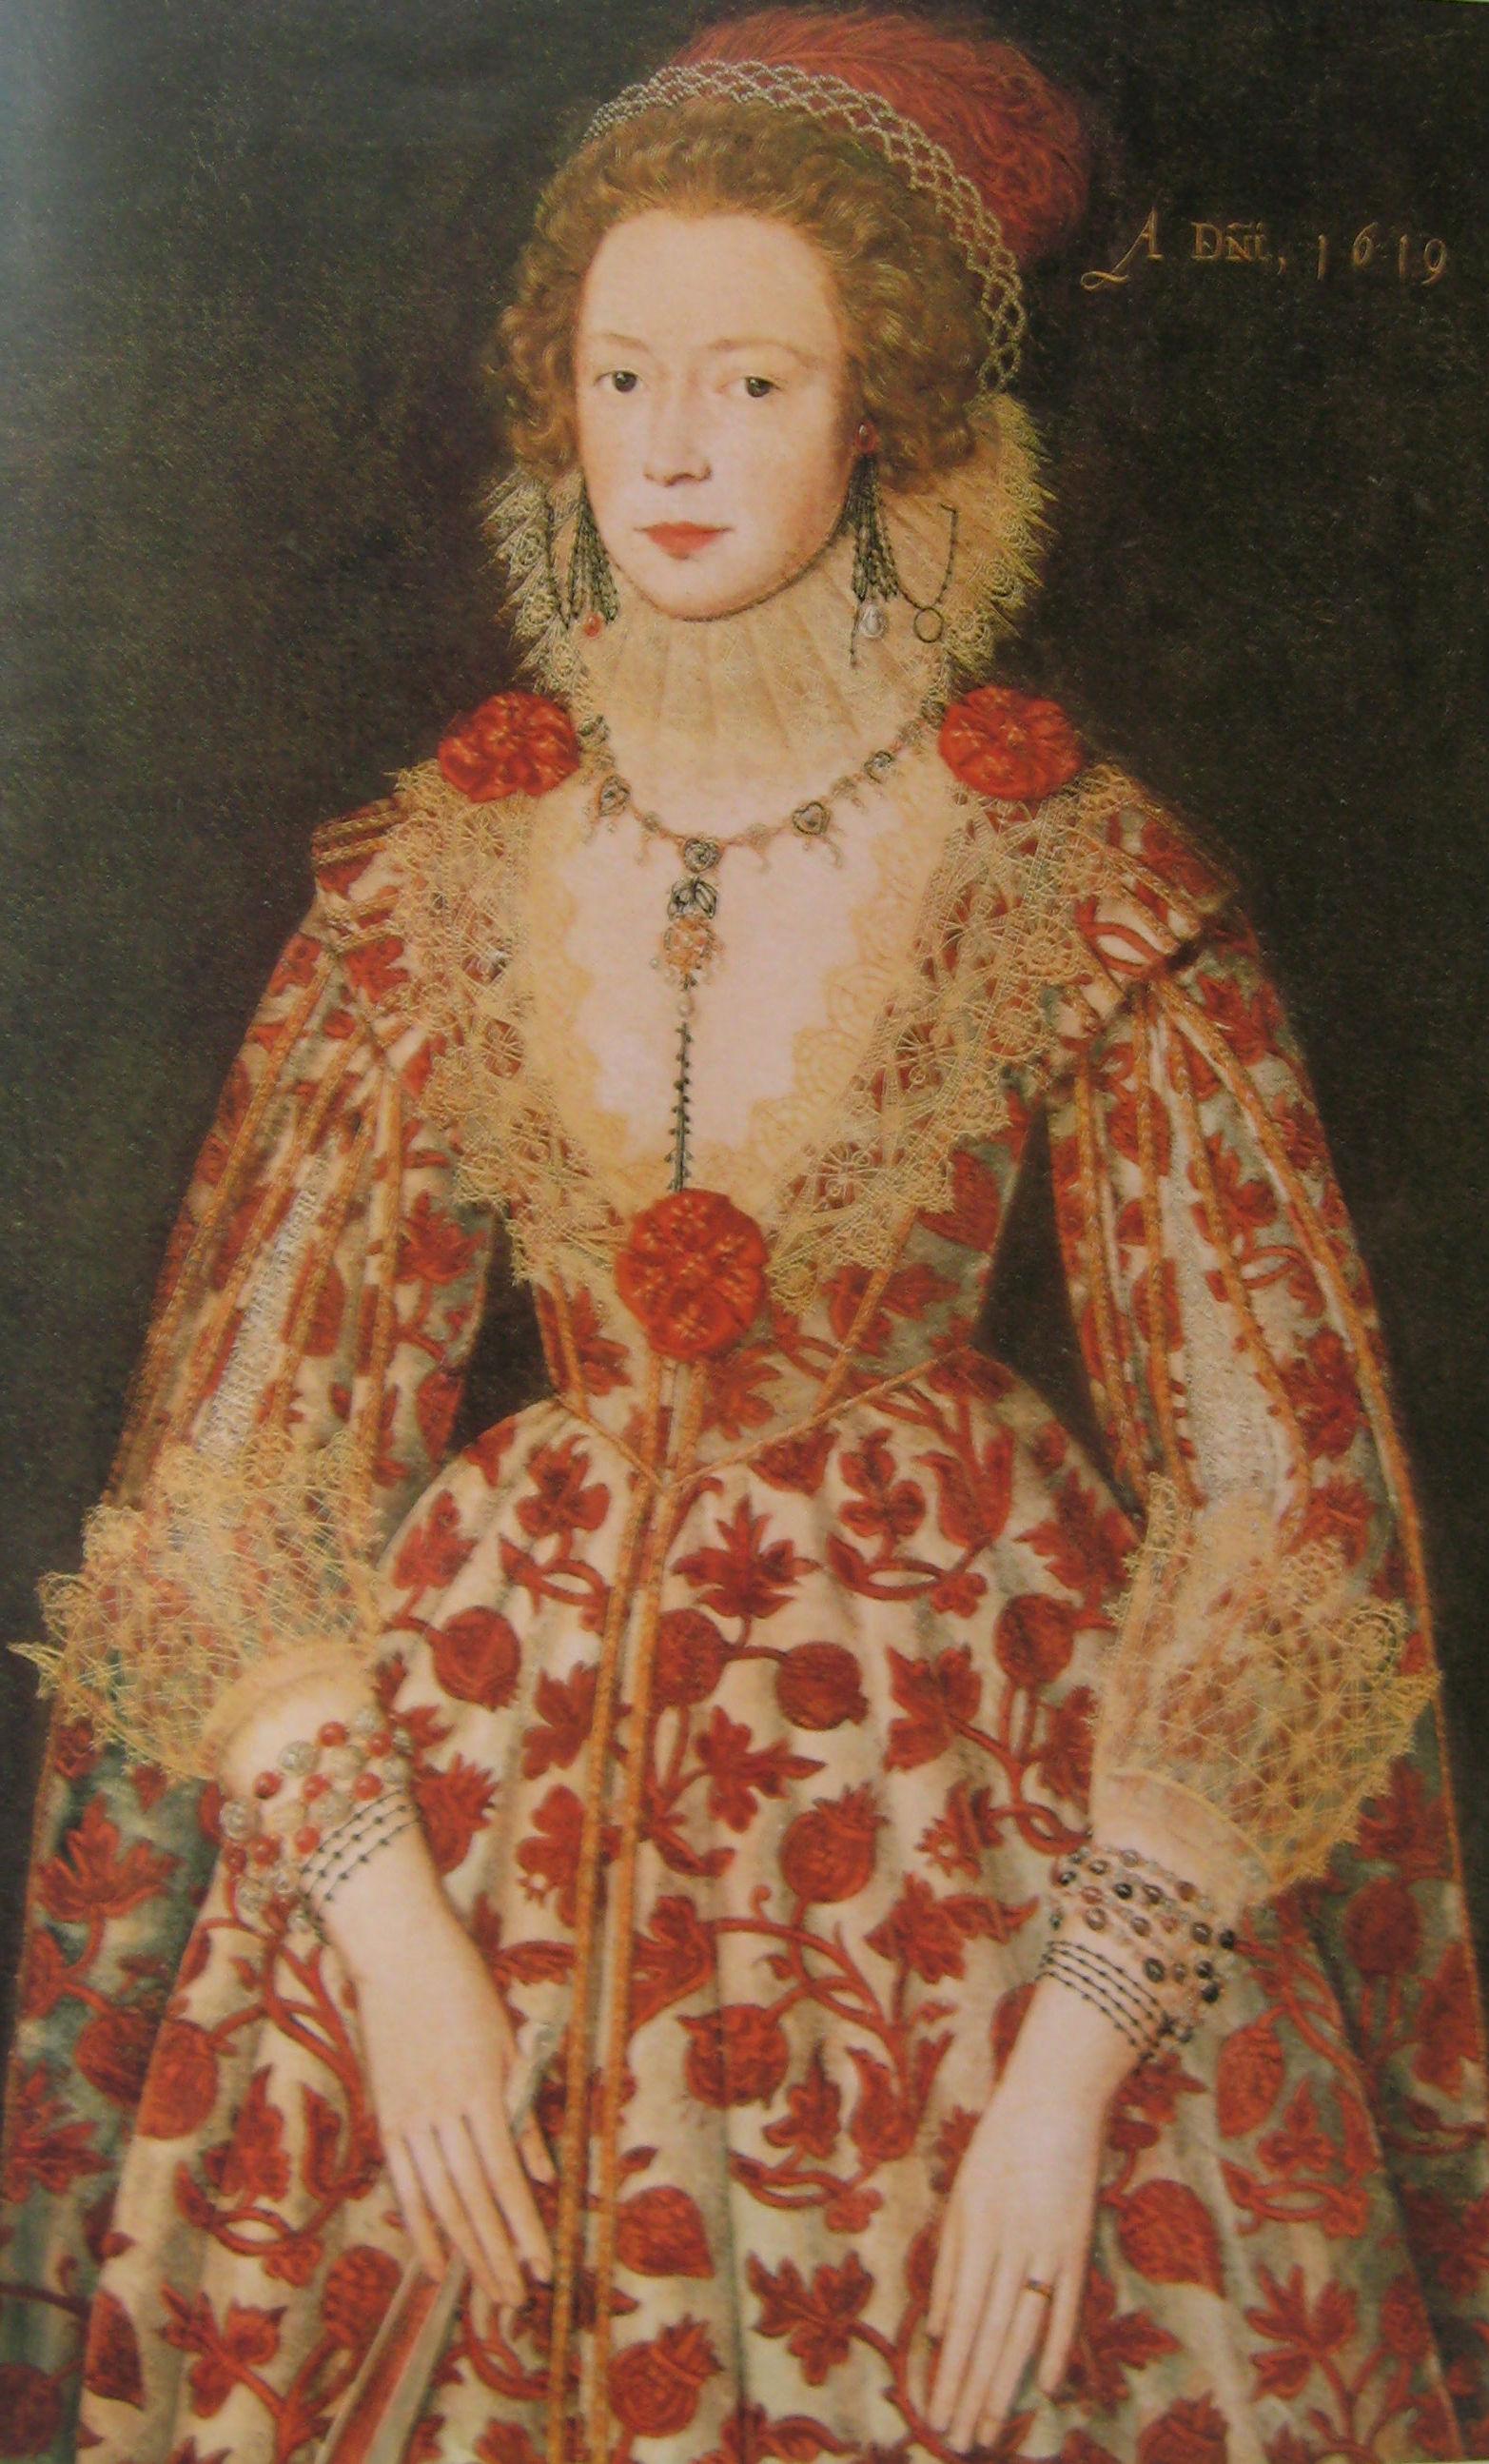 160050 in Western European fashion - Wikipedia Spanish fashion in the 1600s